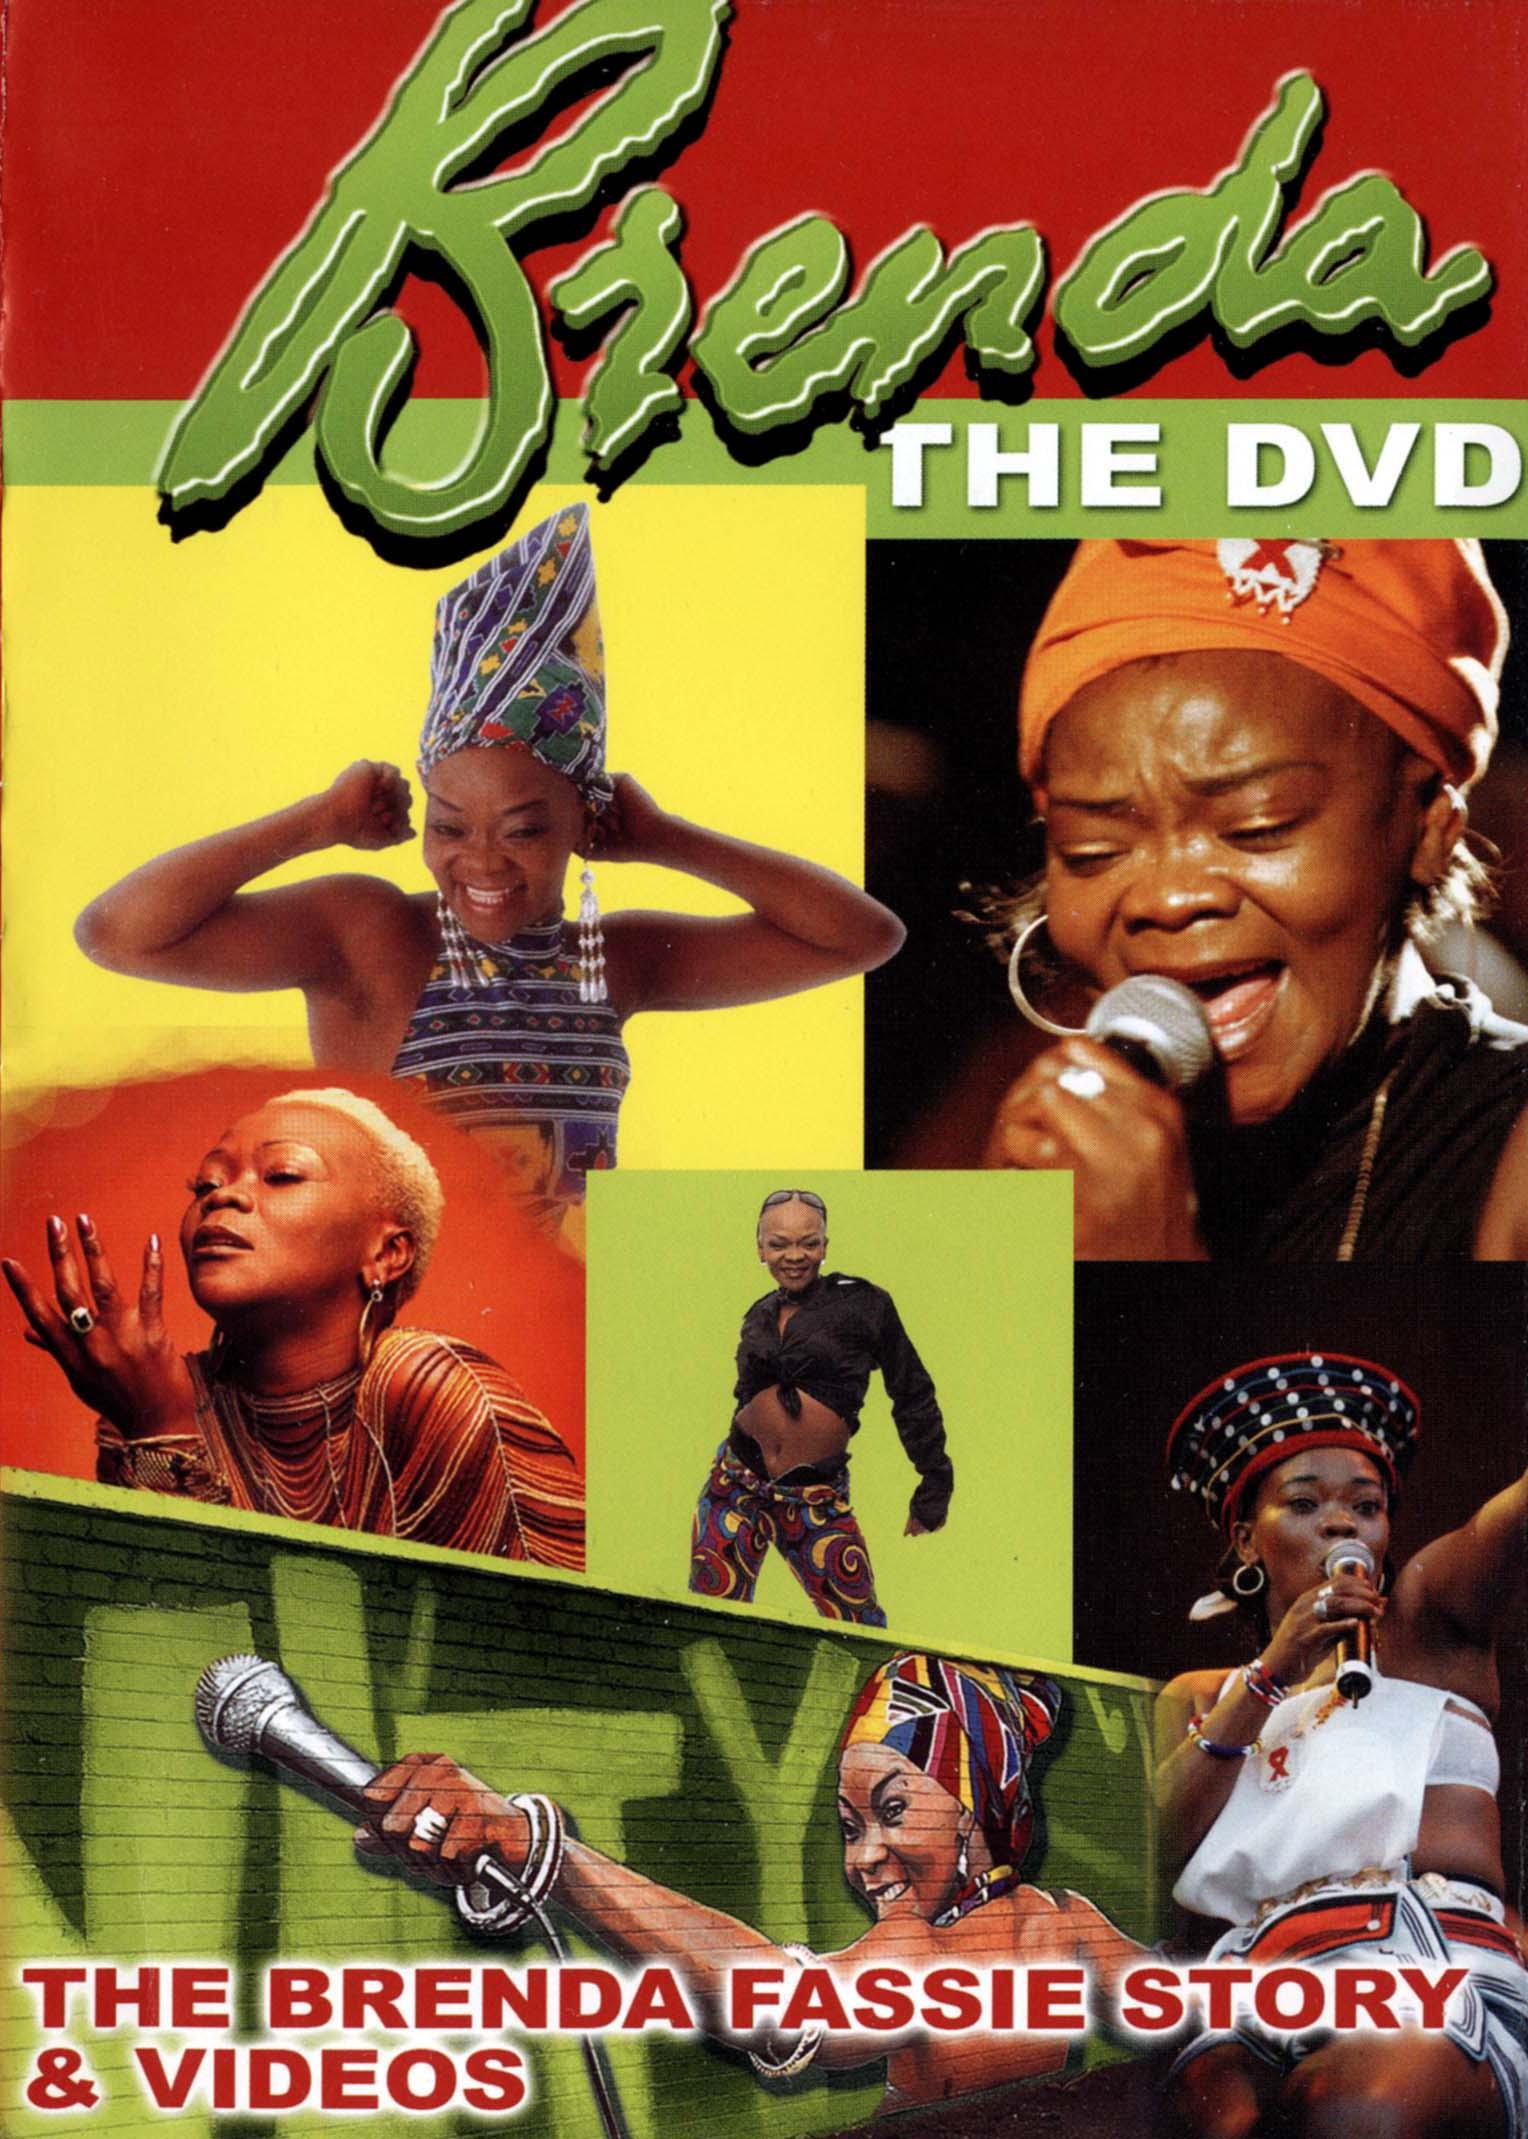 Brenda: The DVD: The Brenda Fassie Story & Videos